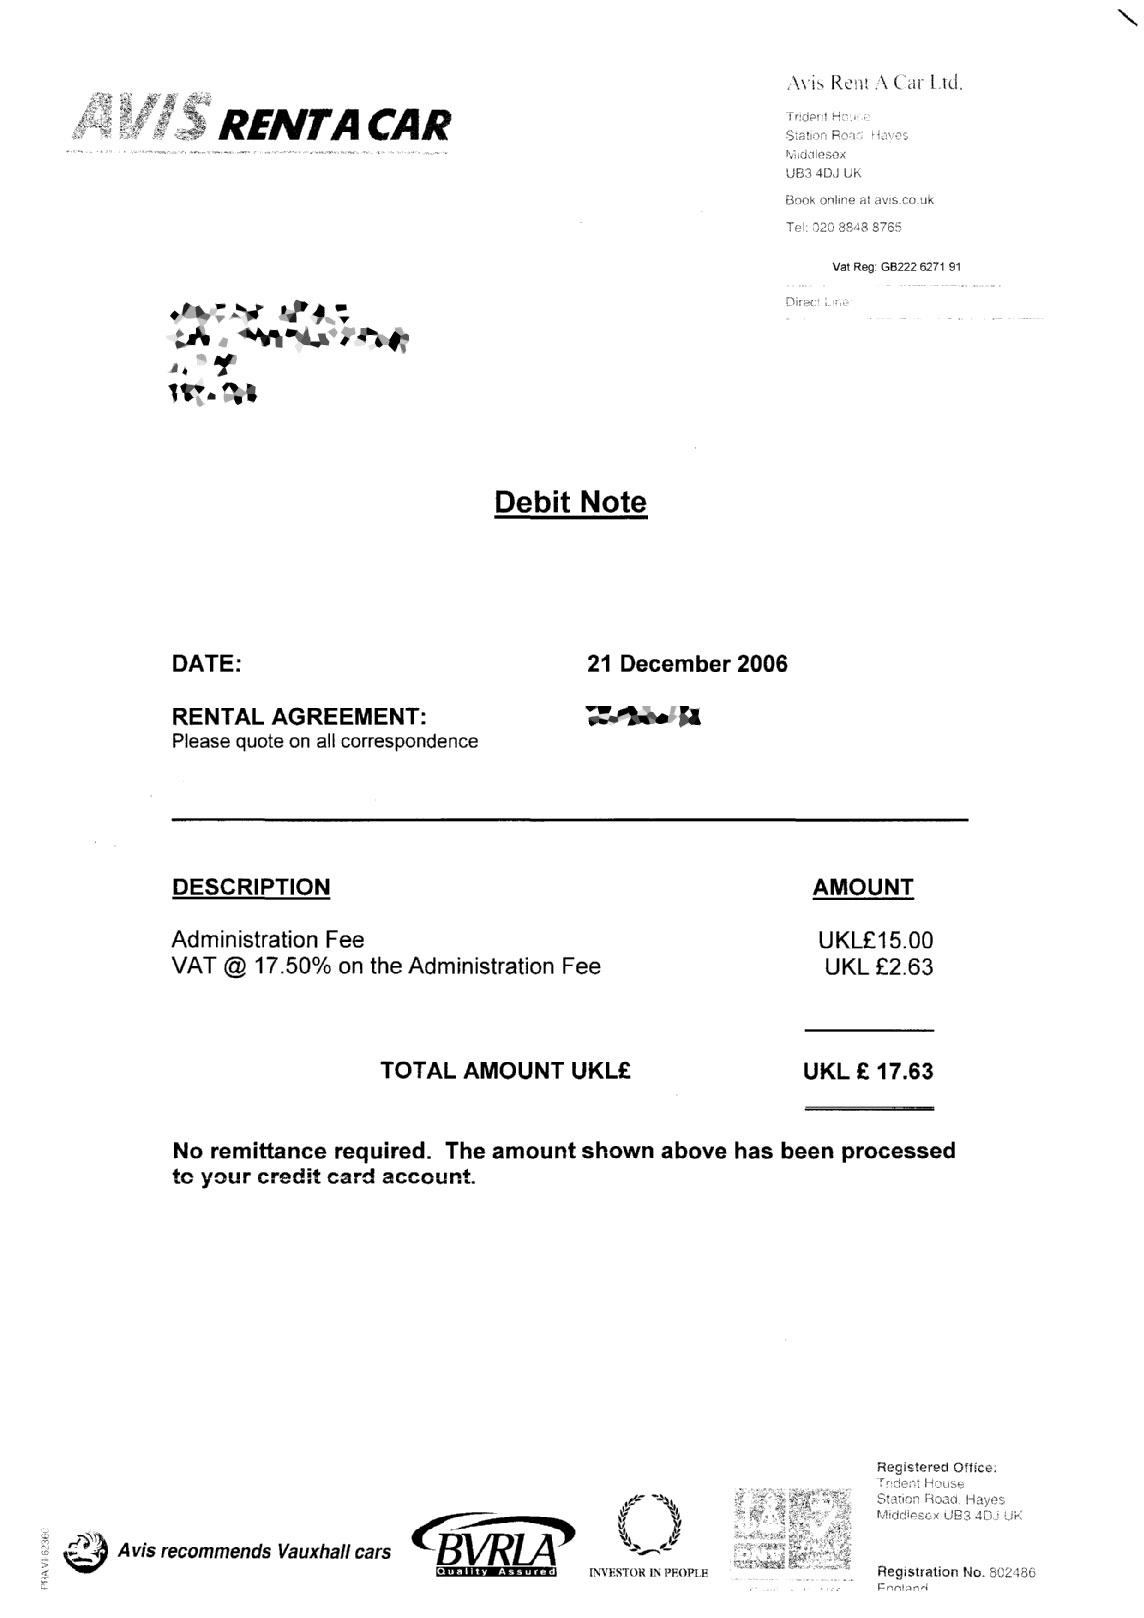 Debit Note Template 3 what is a debit memoreport template – Debit Note Letter